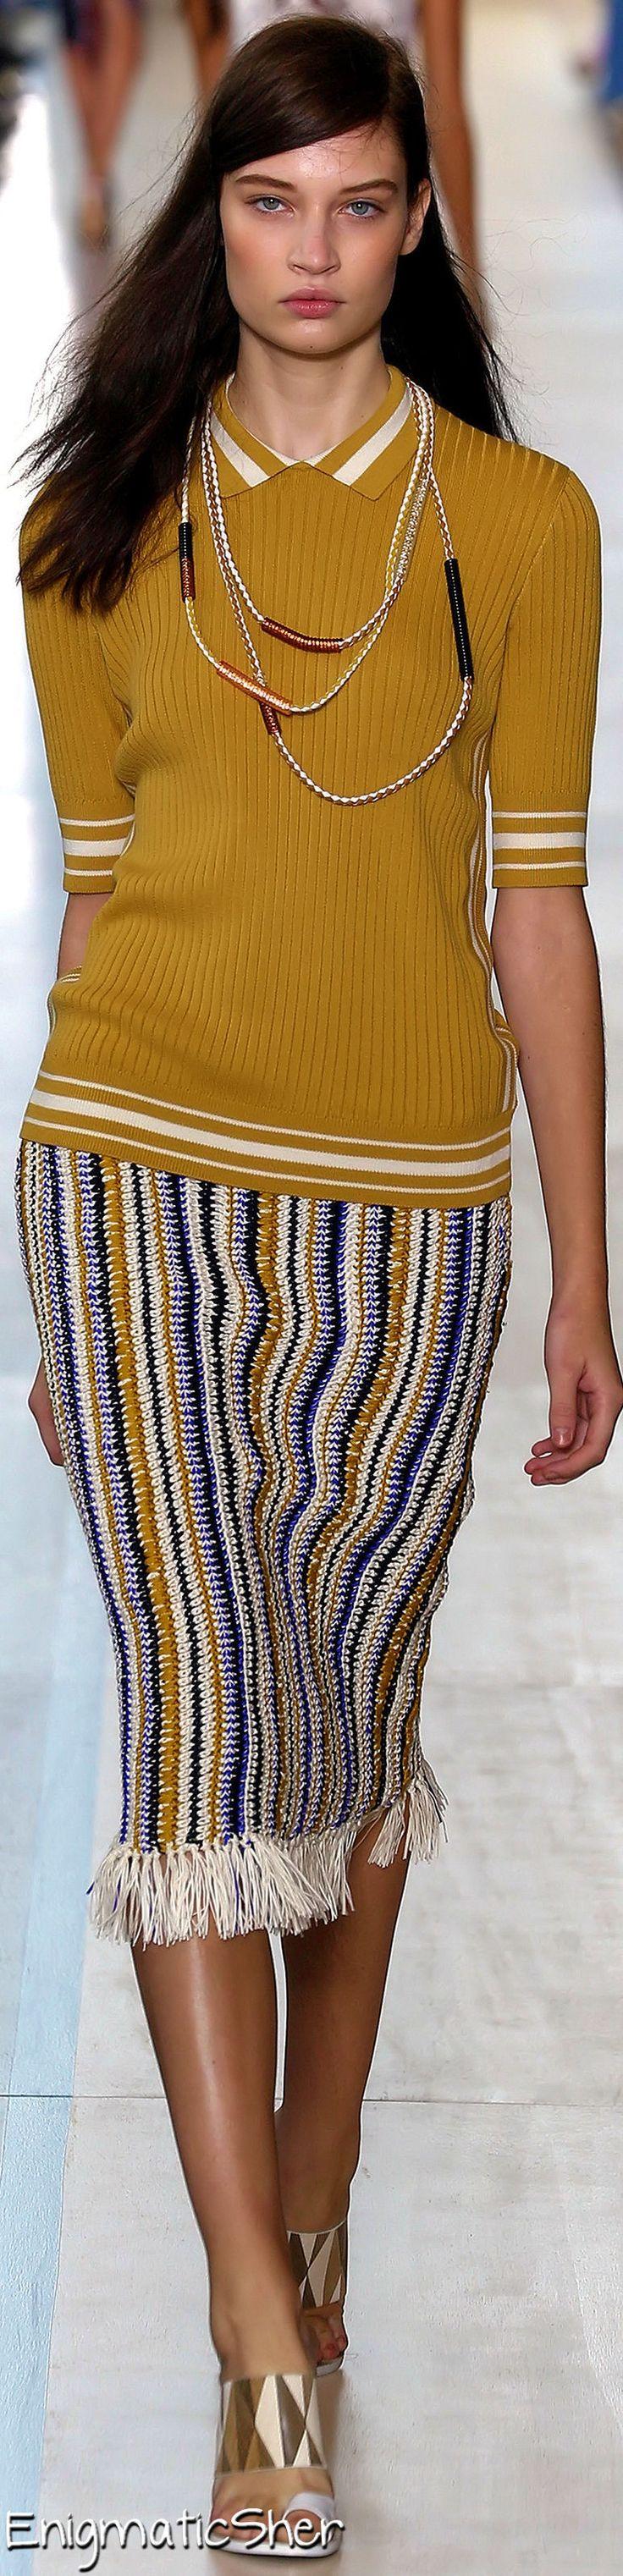 Farb-und Stilberatung mit www.farben-reich.com - Tory Burch Spring Summer 2015 Ready-To-Wear